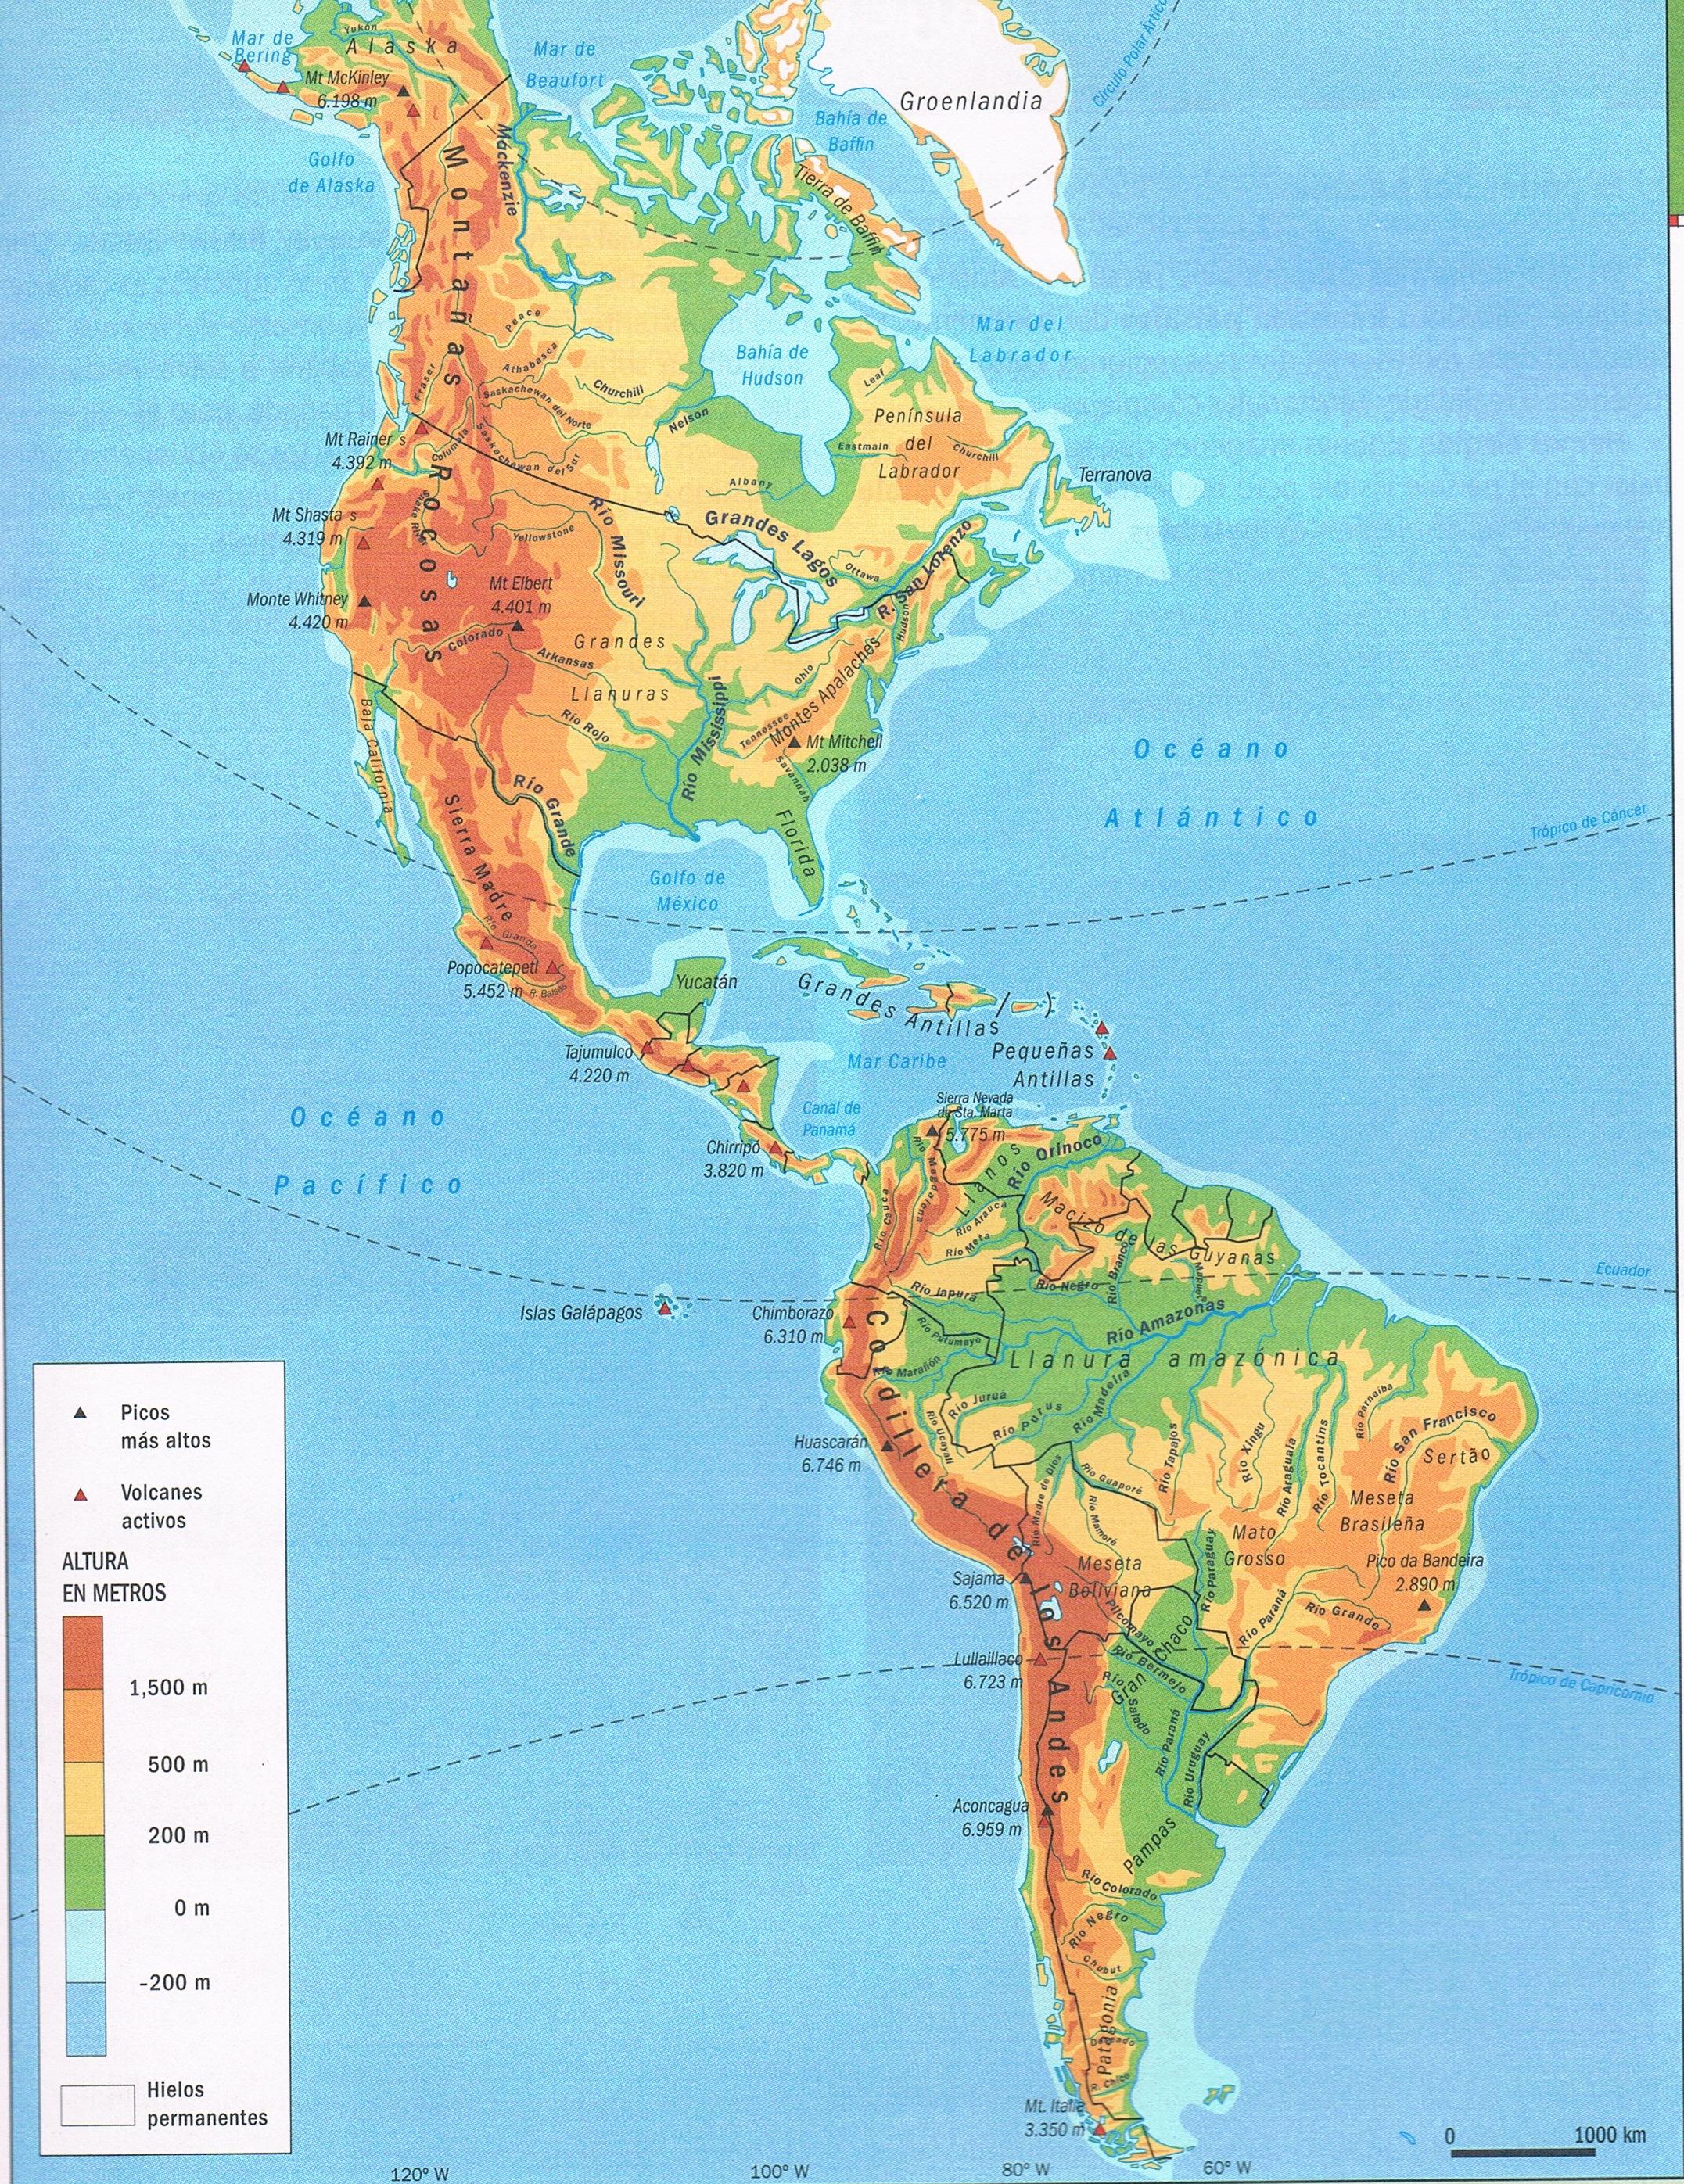 Mapa Orográfico De América Mapa De América